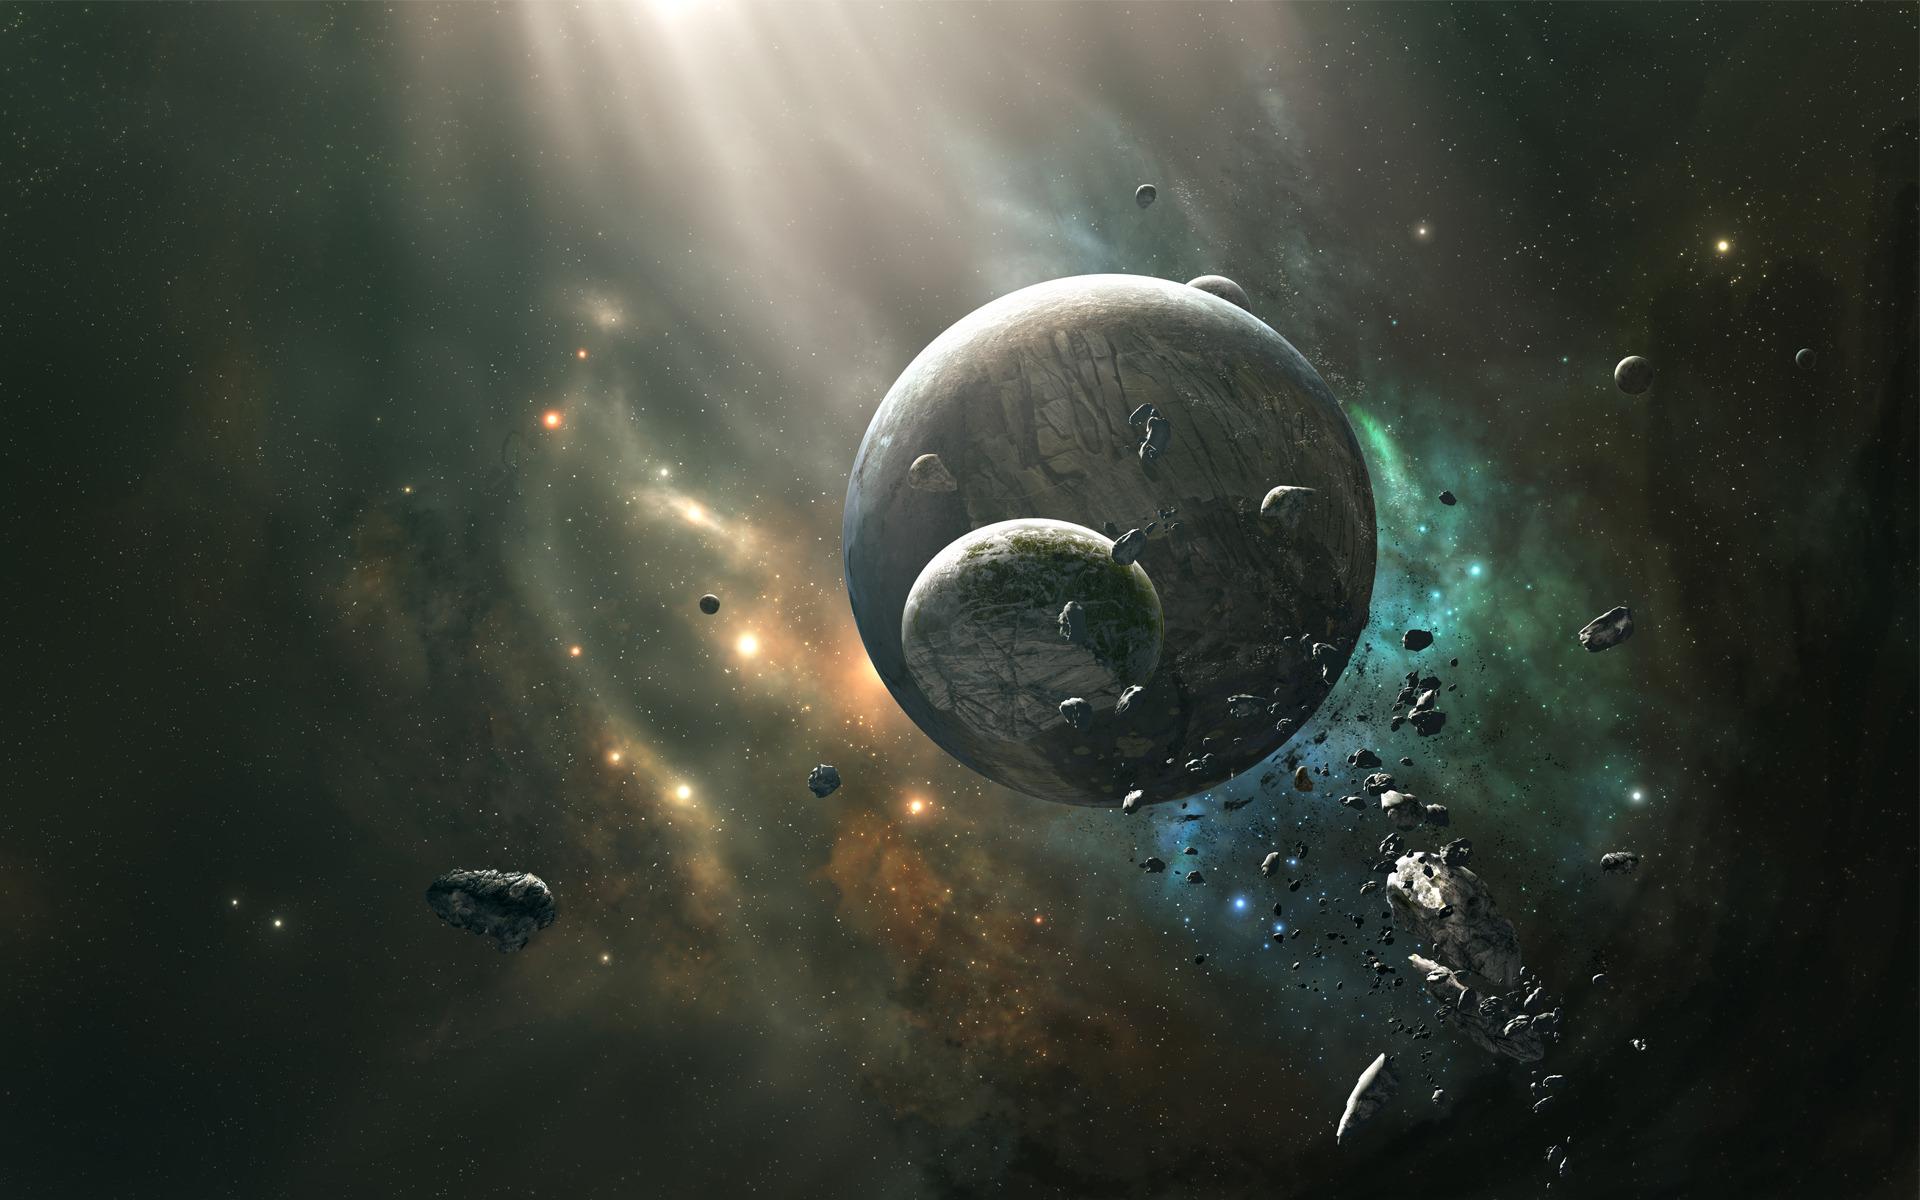 раскол спутника планеты, астероиды, метеориты